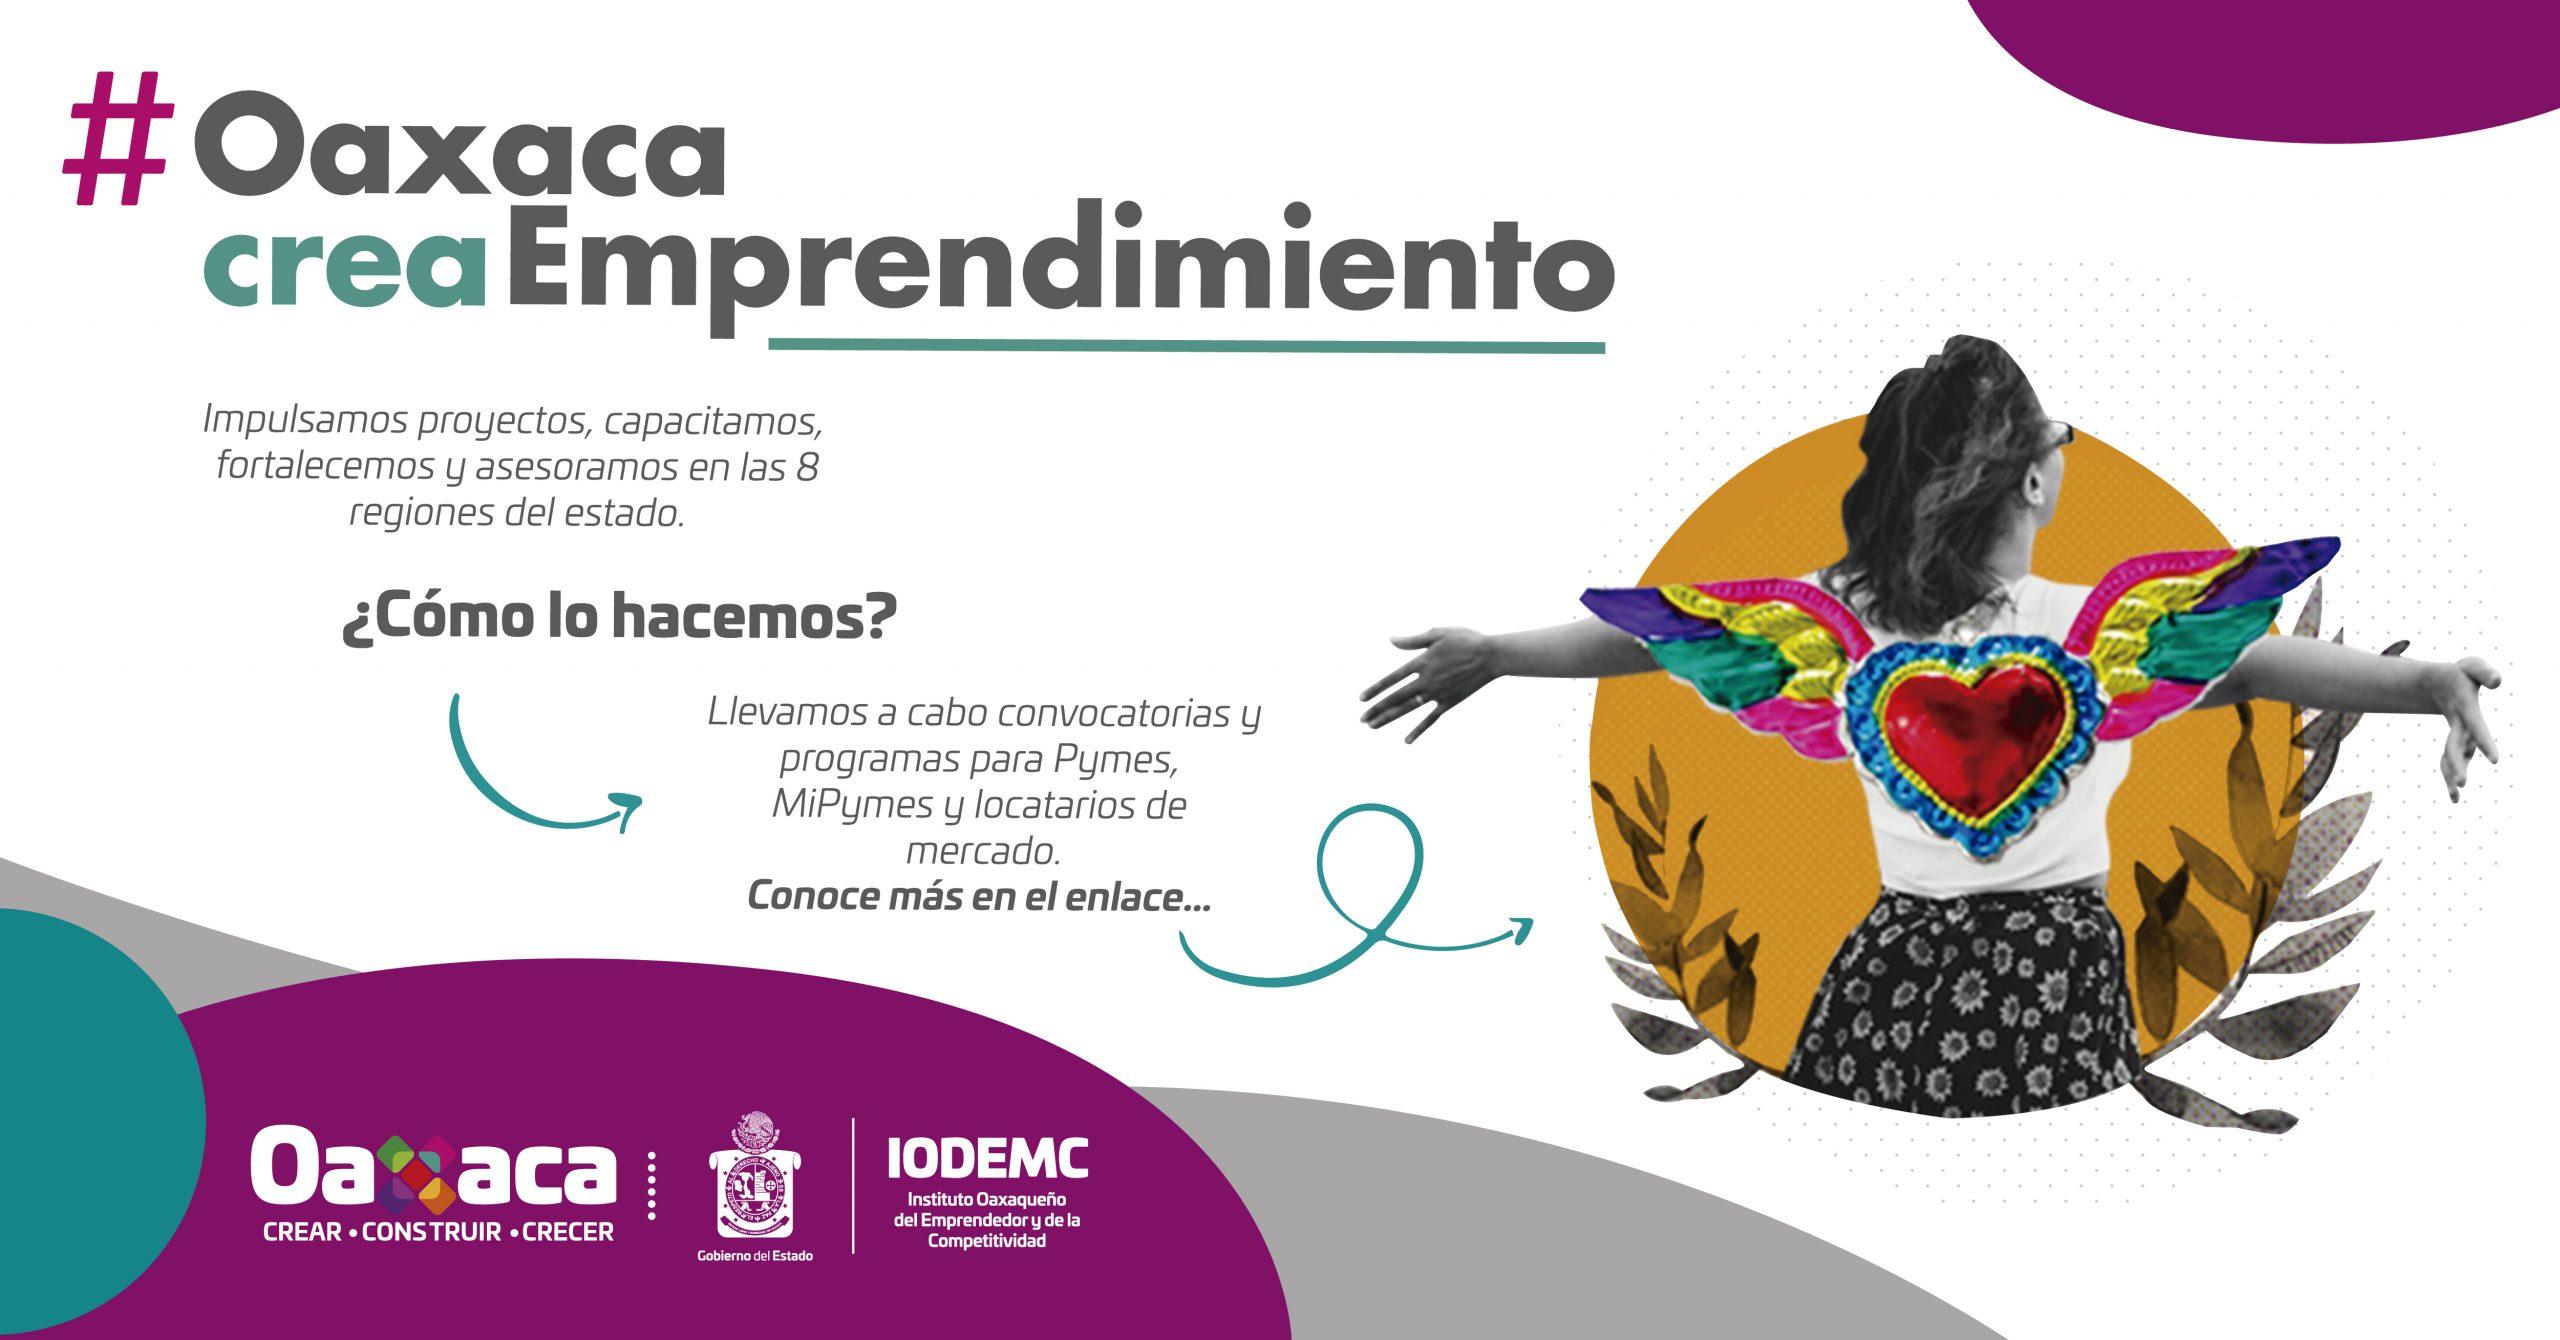 Oaxaca #creaEmprendimiento